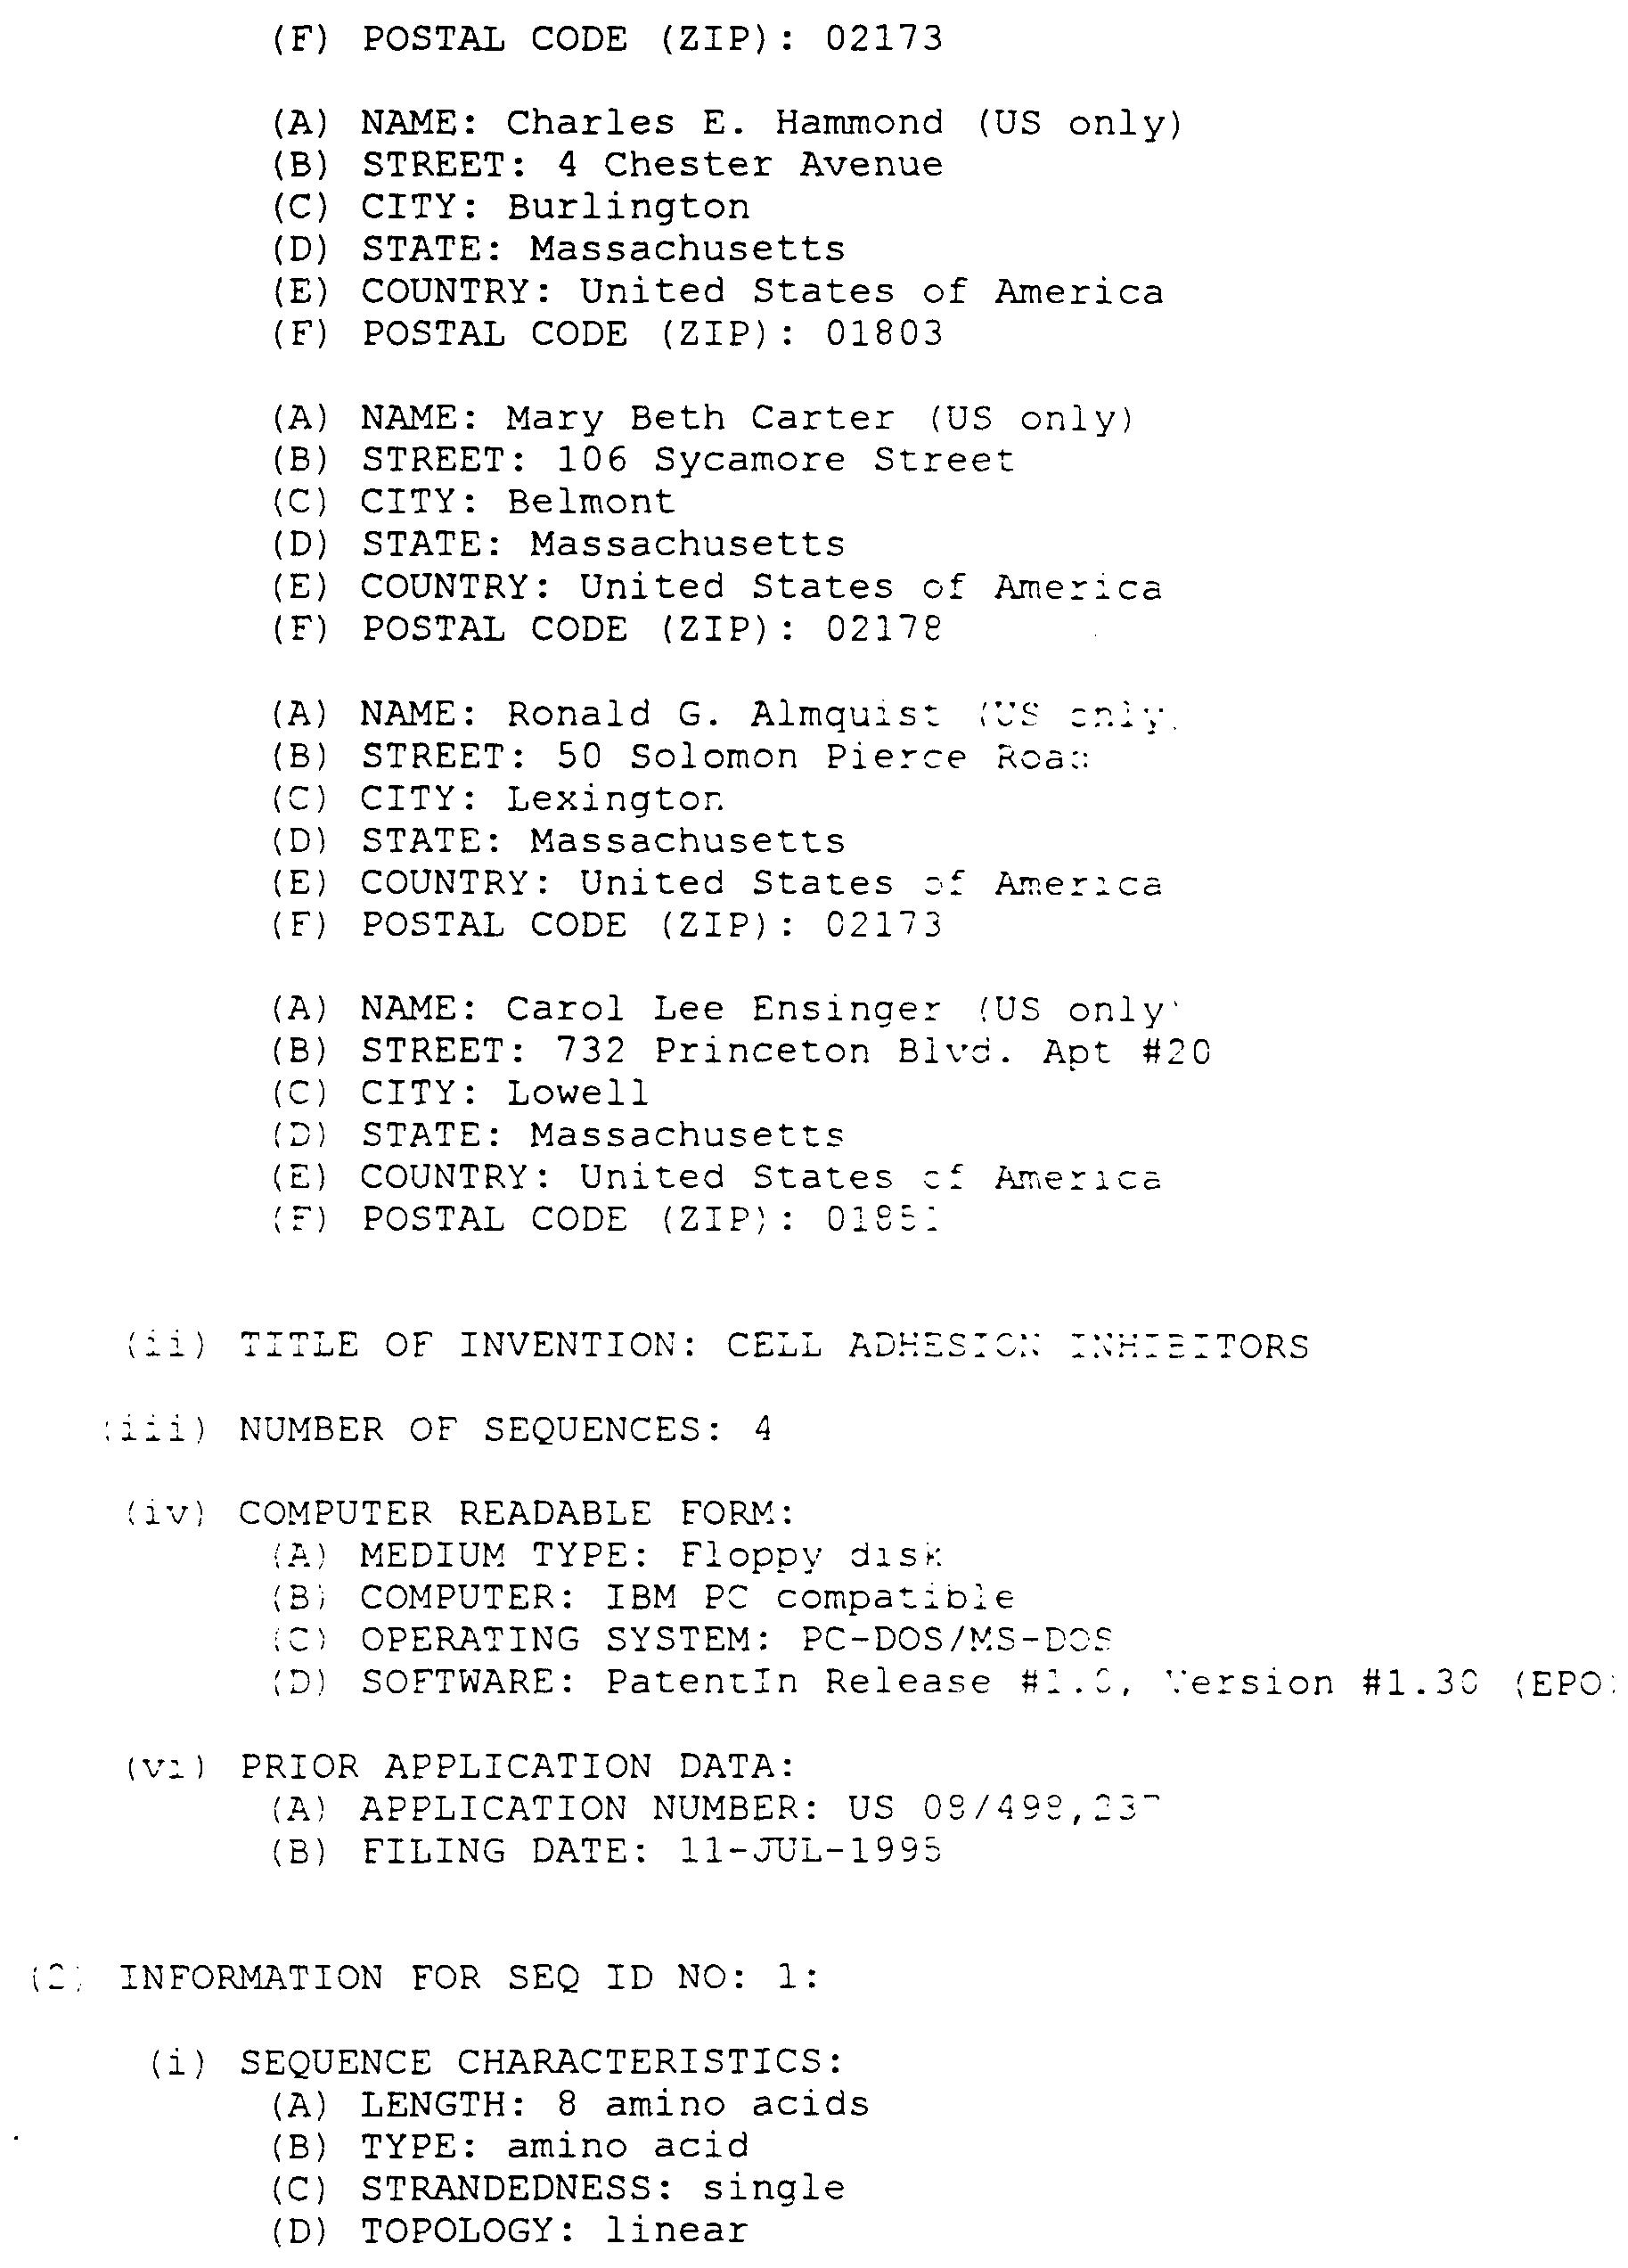 Patent WOA Cell Adhesion Inhibitors Google Patents - Us zip code type